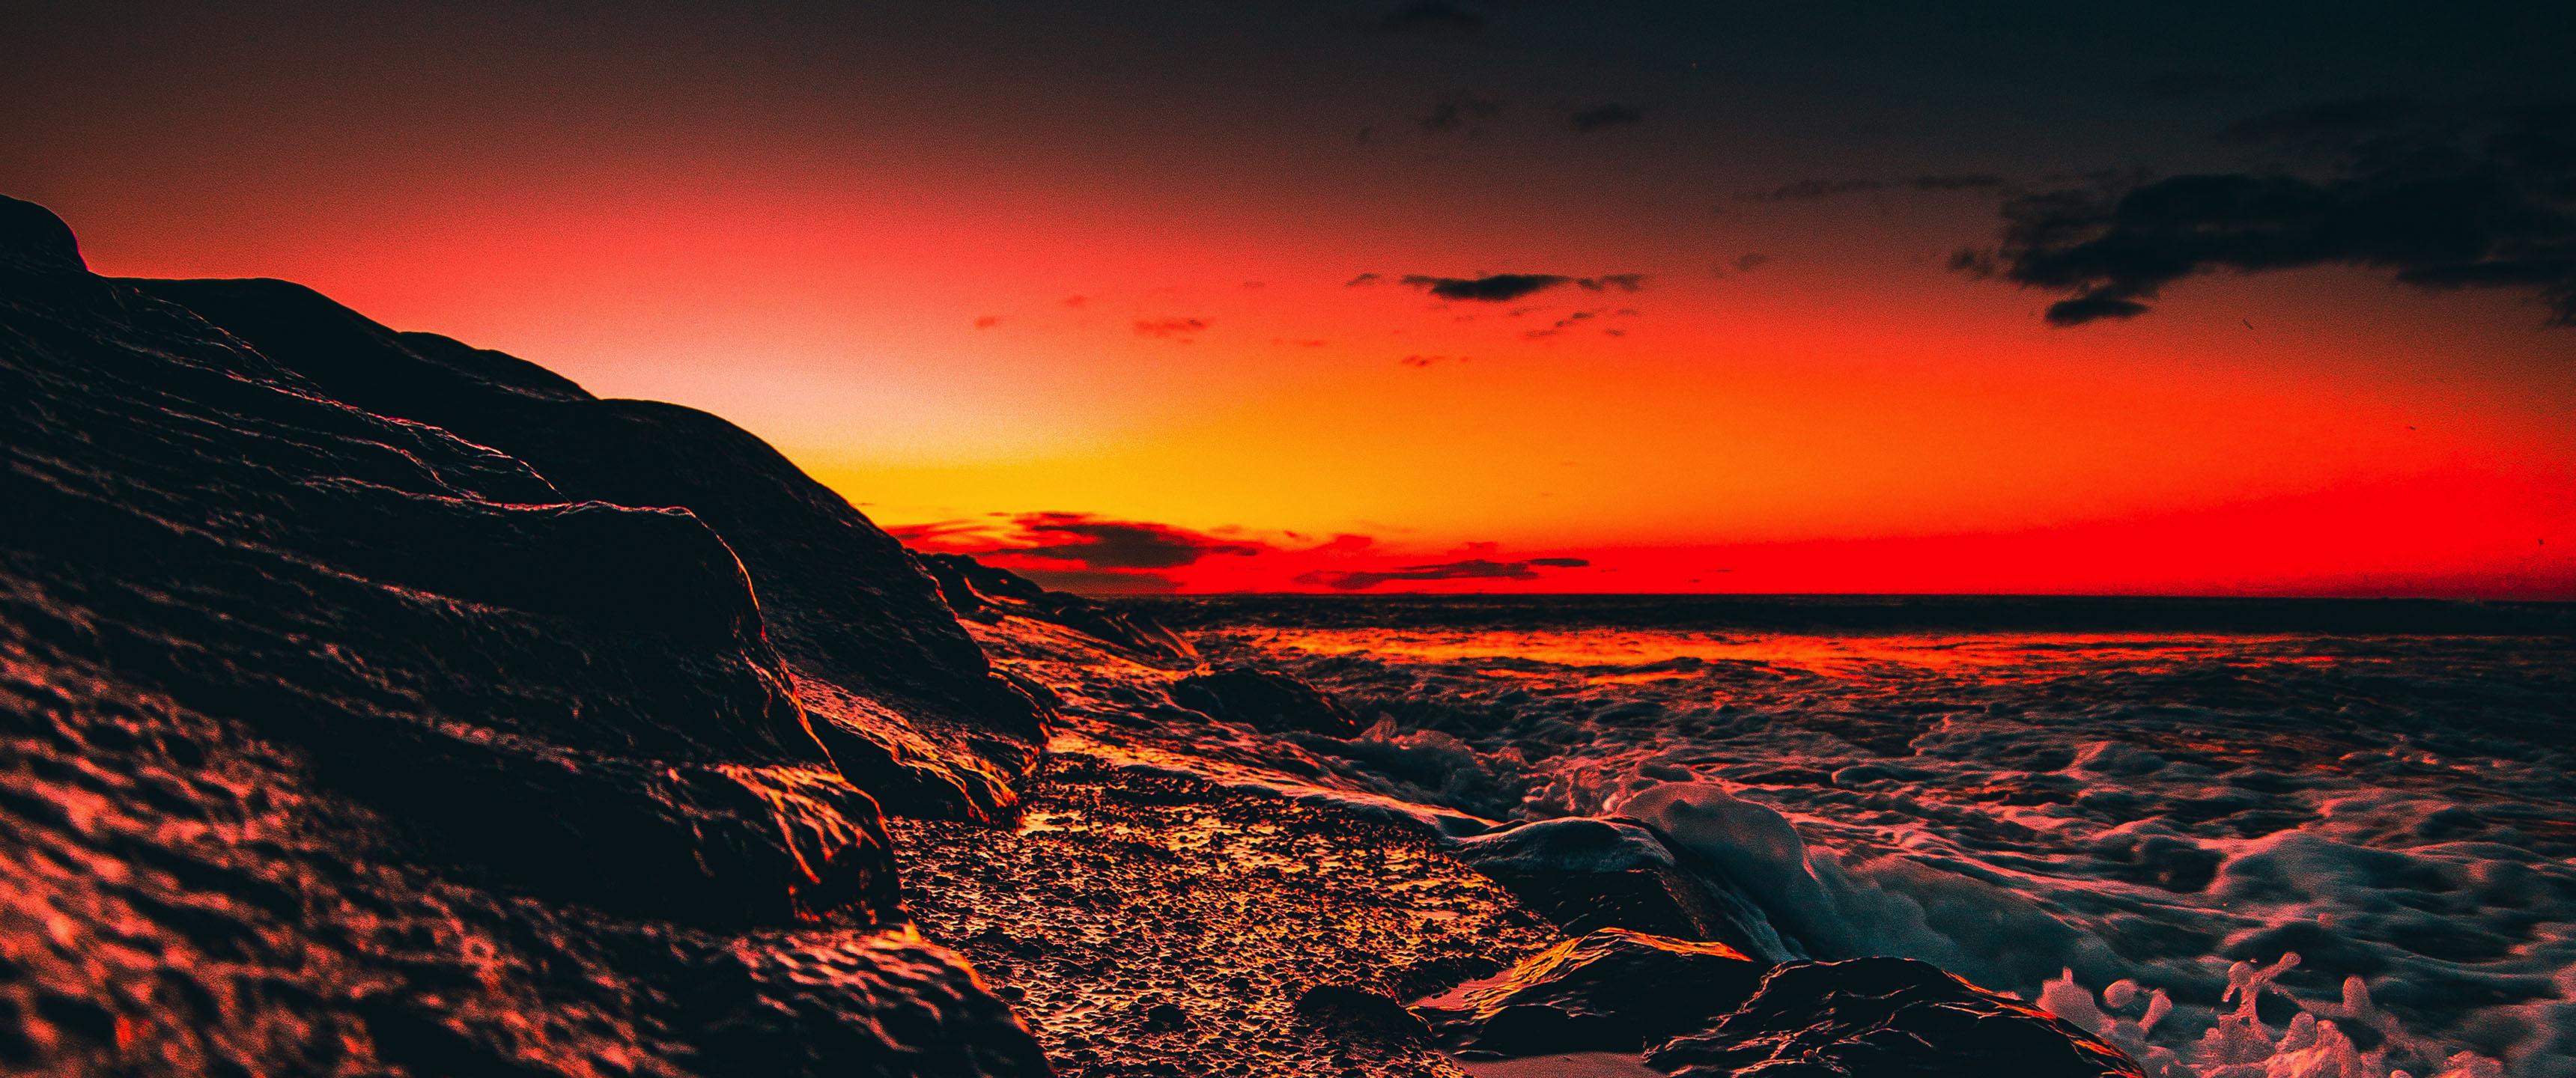 Sunset Waves 21:9 Wallpaper | Ultrawide Monitor 21:9 ...